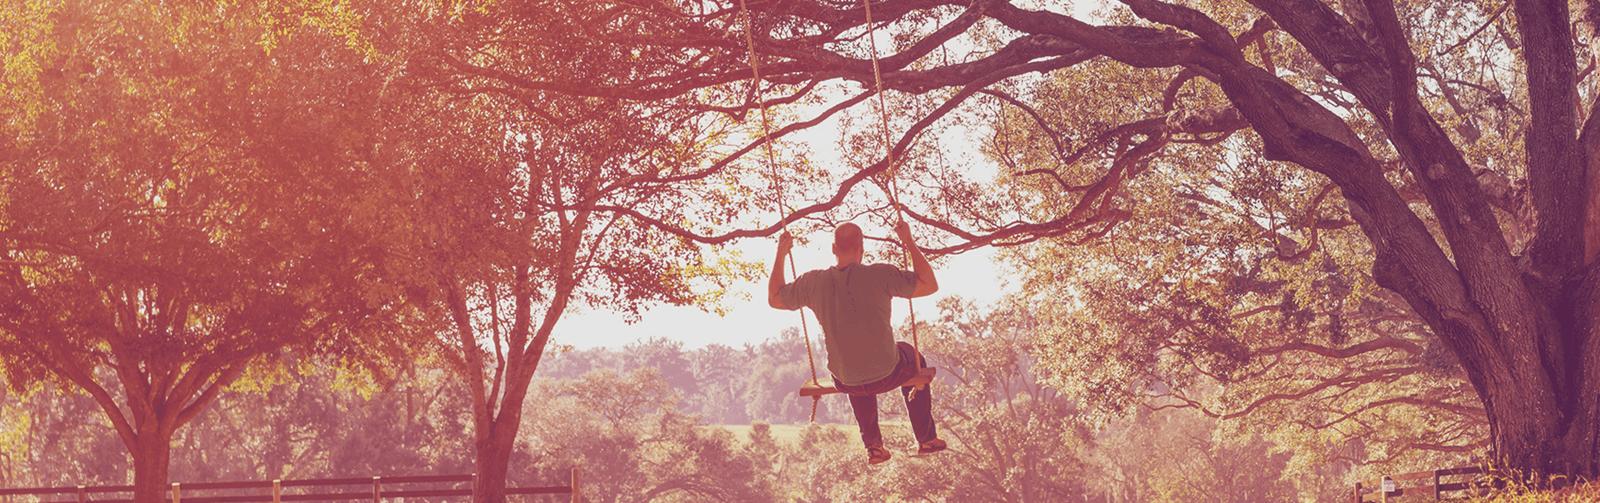 Image of man on swing